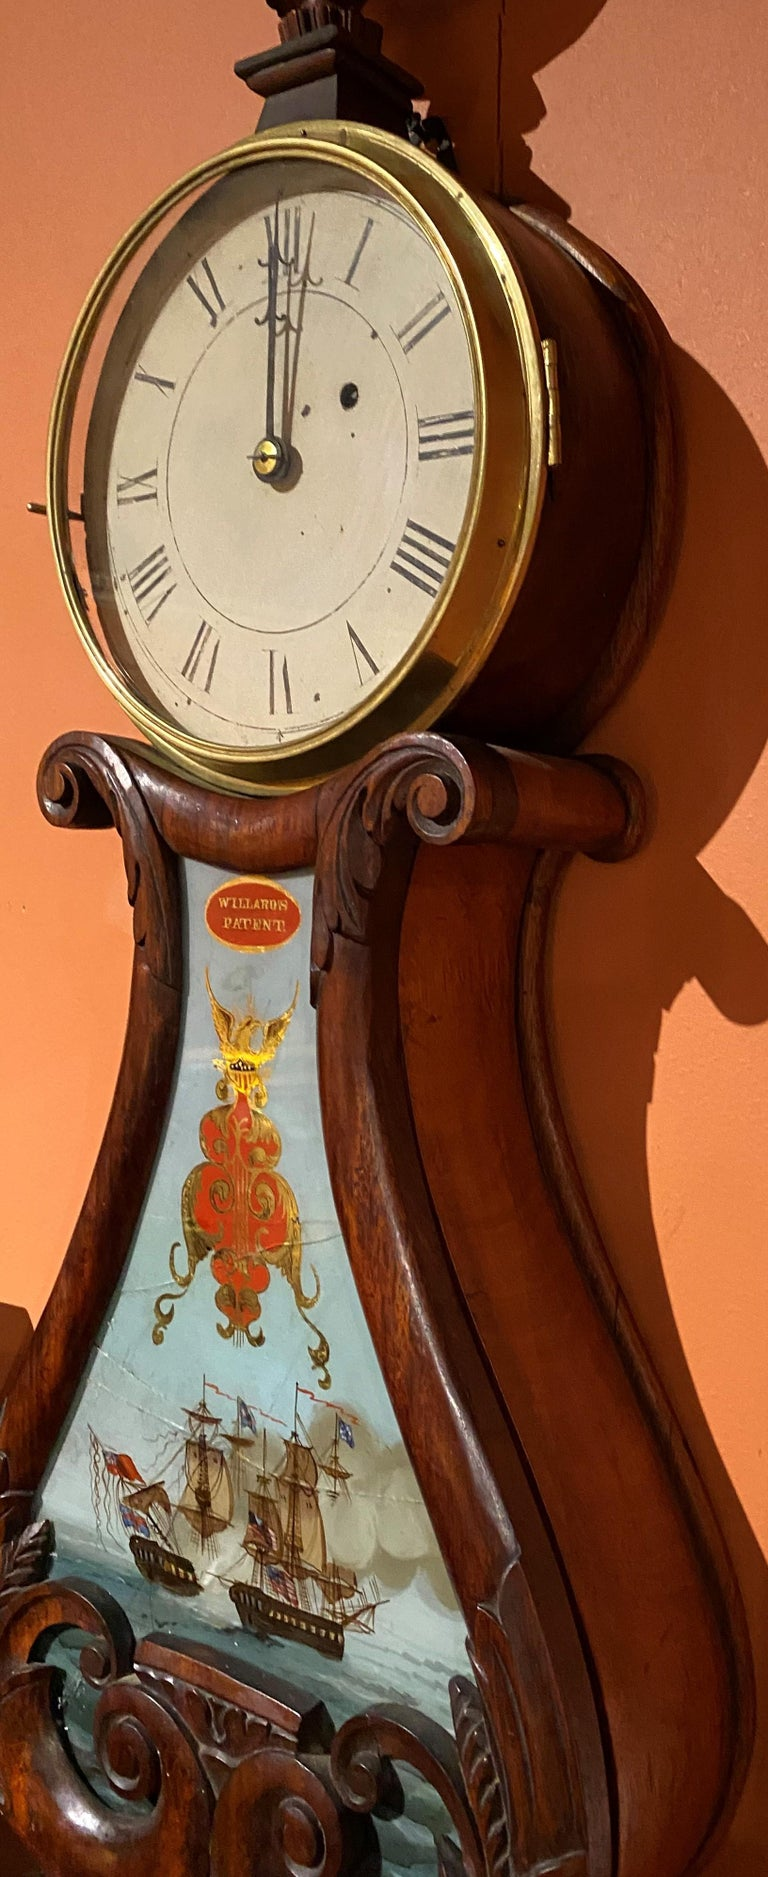 19th Century Aaron Willard Lyre Clock in Mahogany Case w/ Battling Tall Ships Eglomise Panel